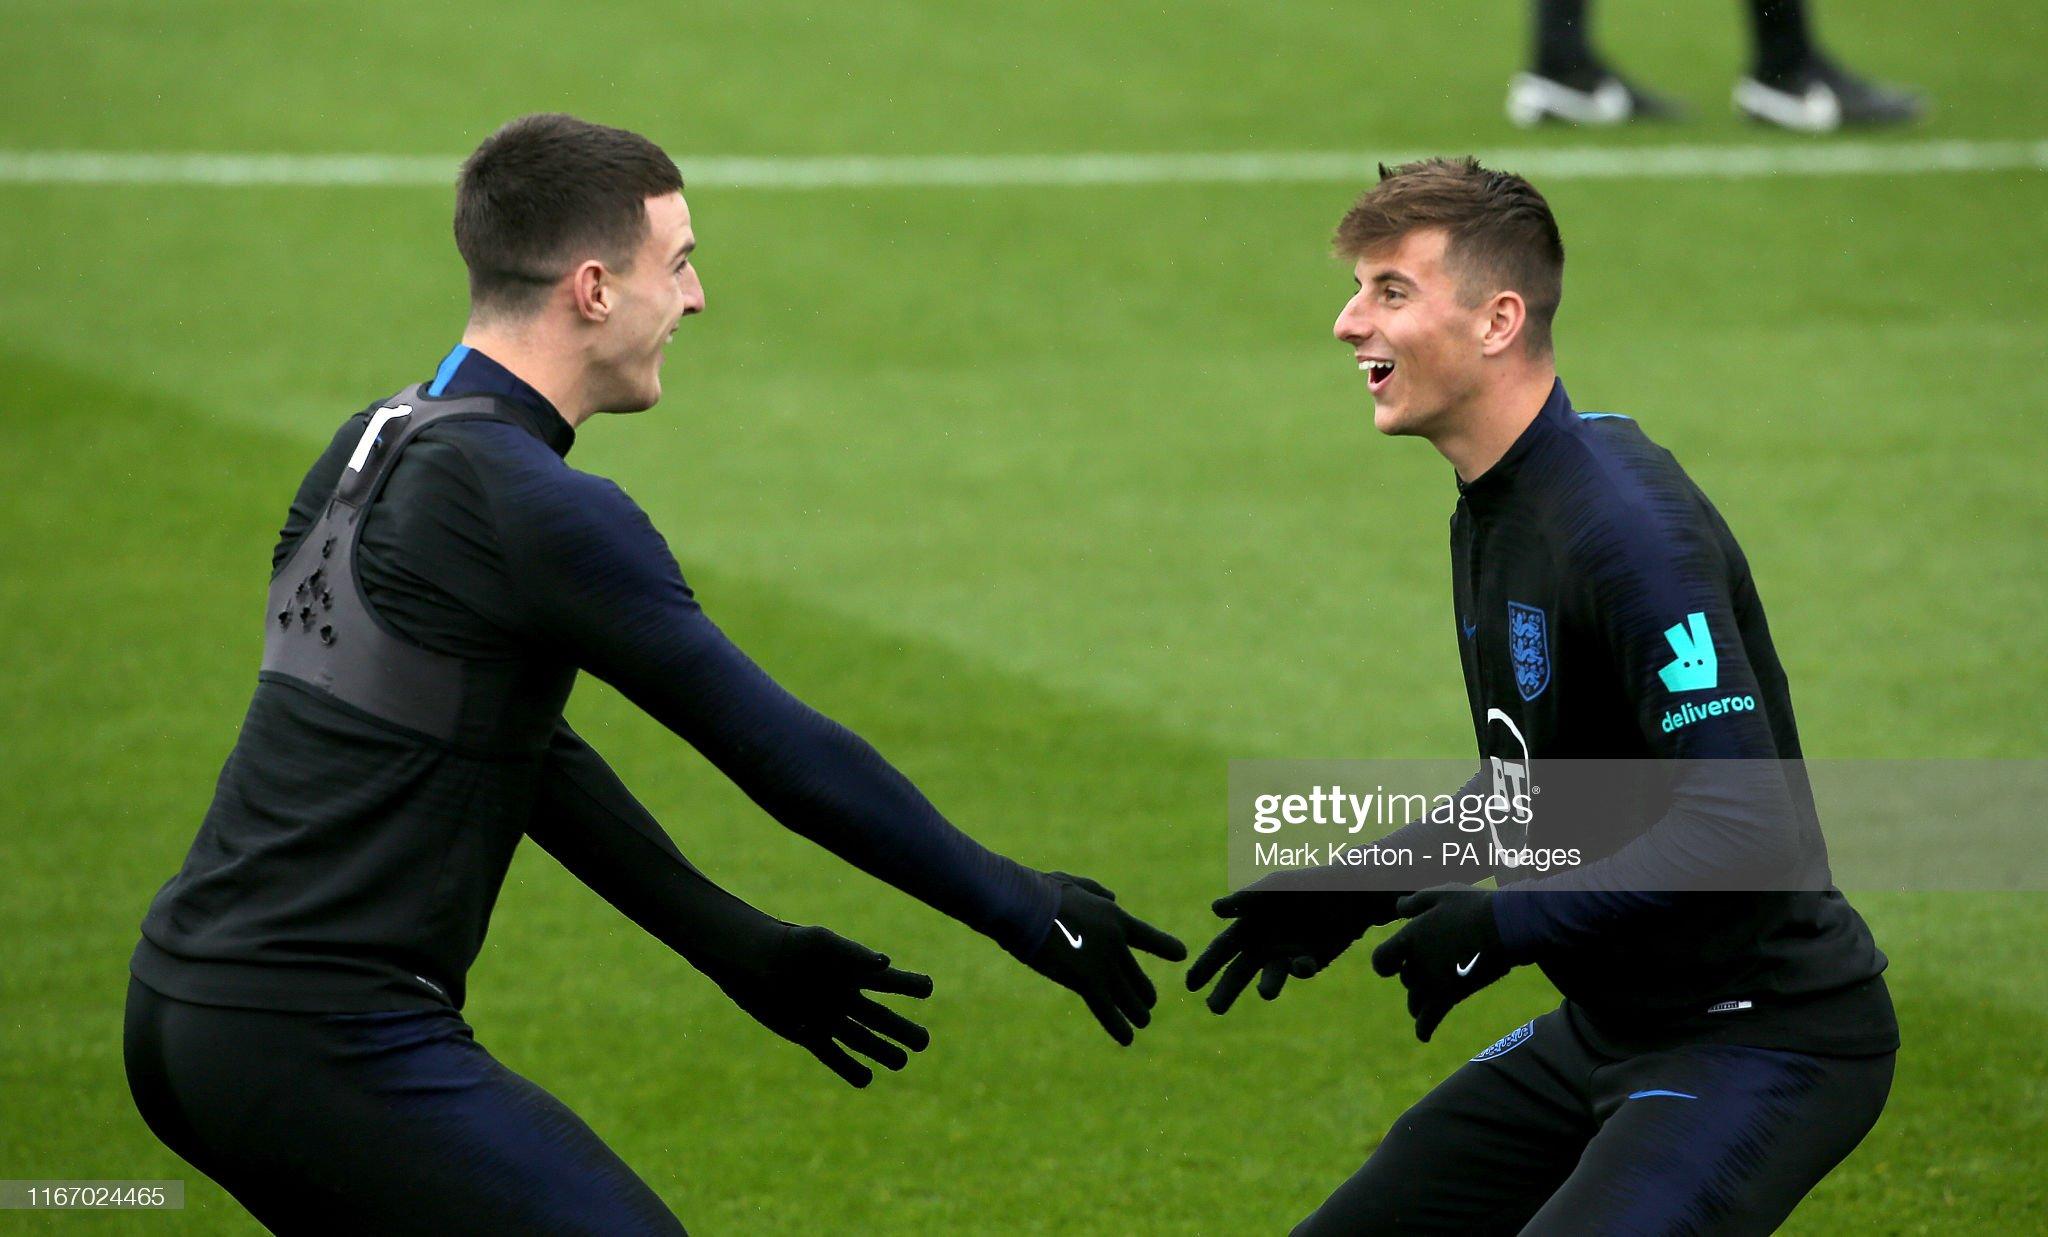 England Training Session - Southampton FC Training Ground : News Photo